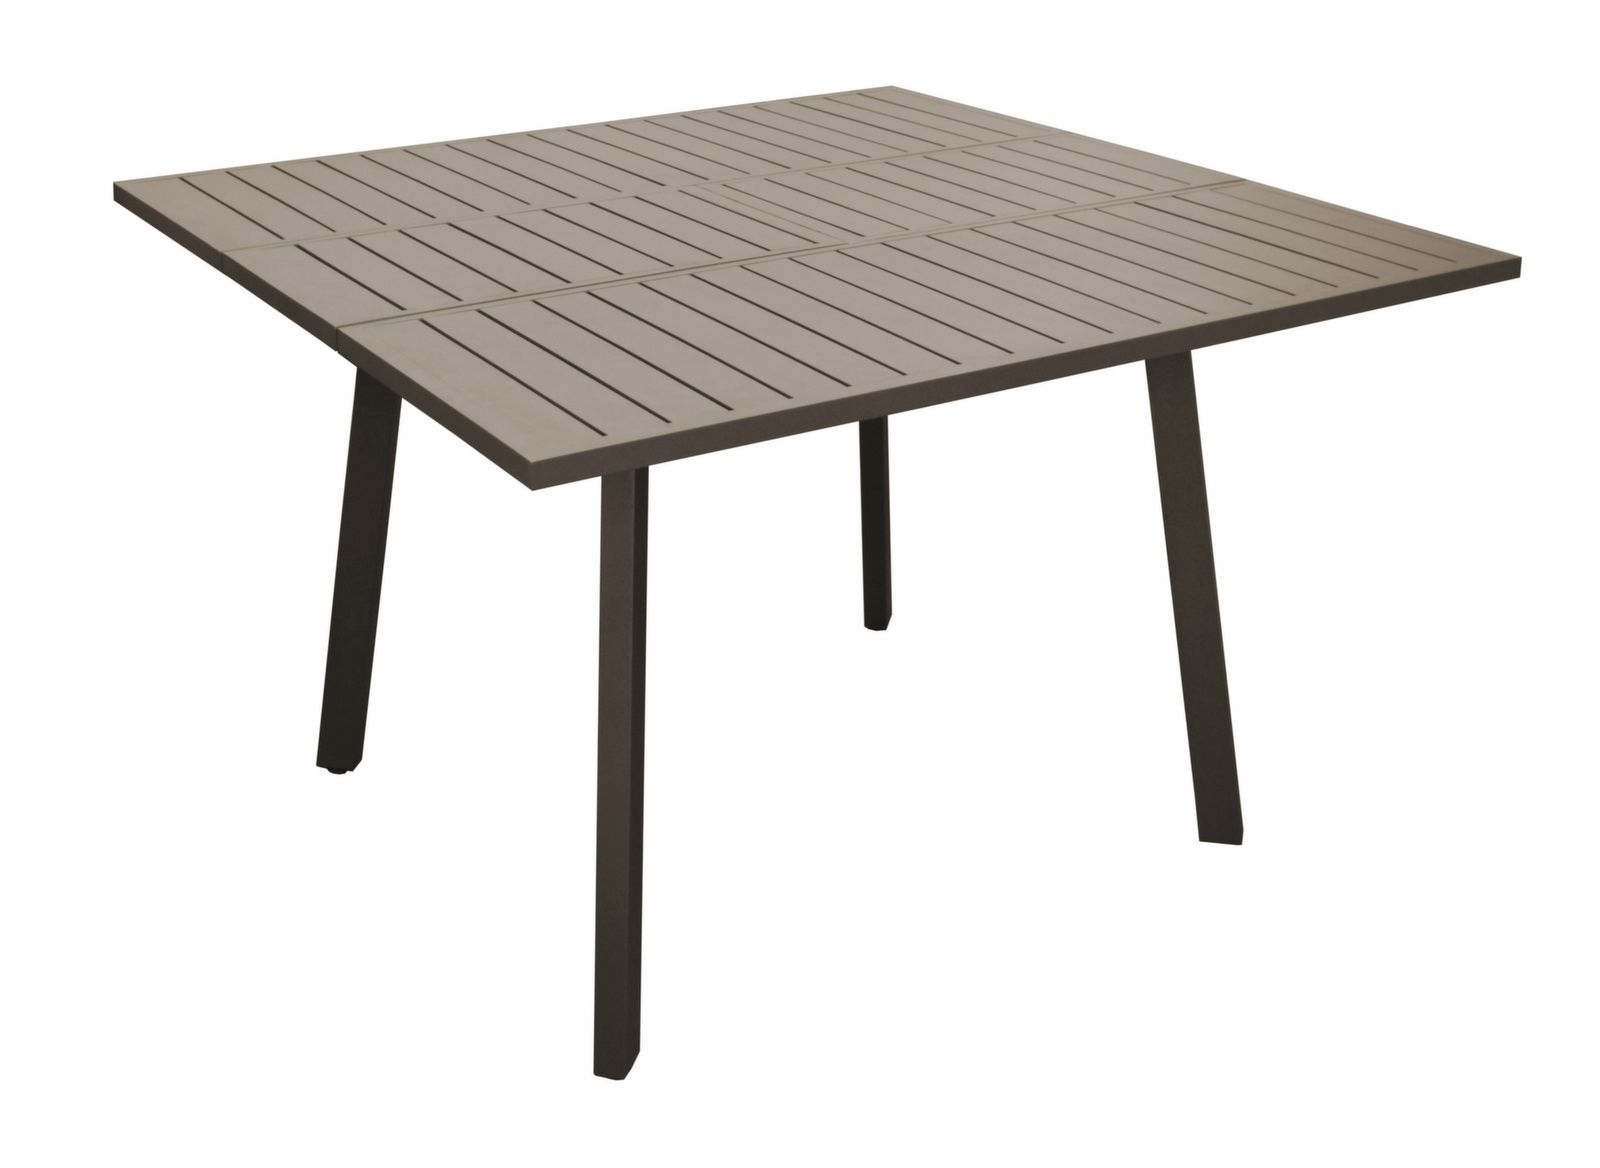 Table Barcelona 100/145x145 cm